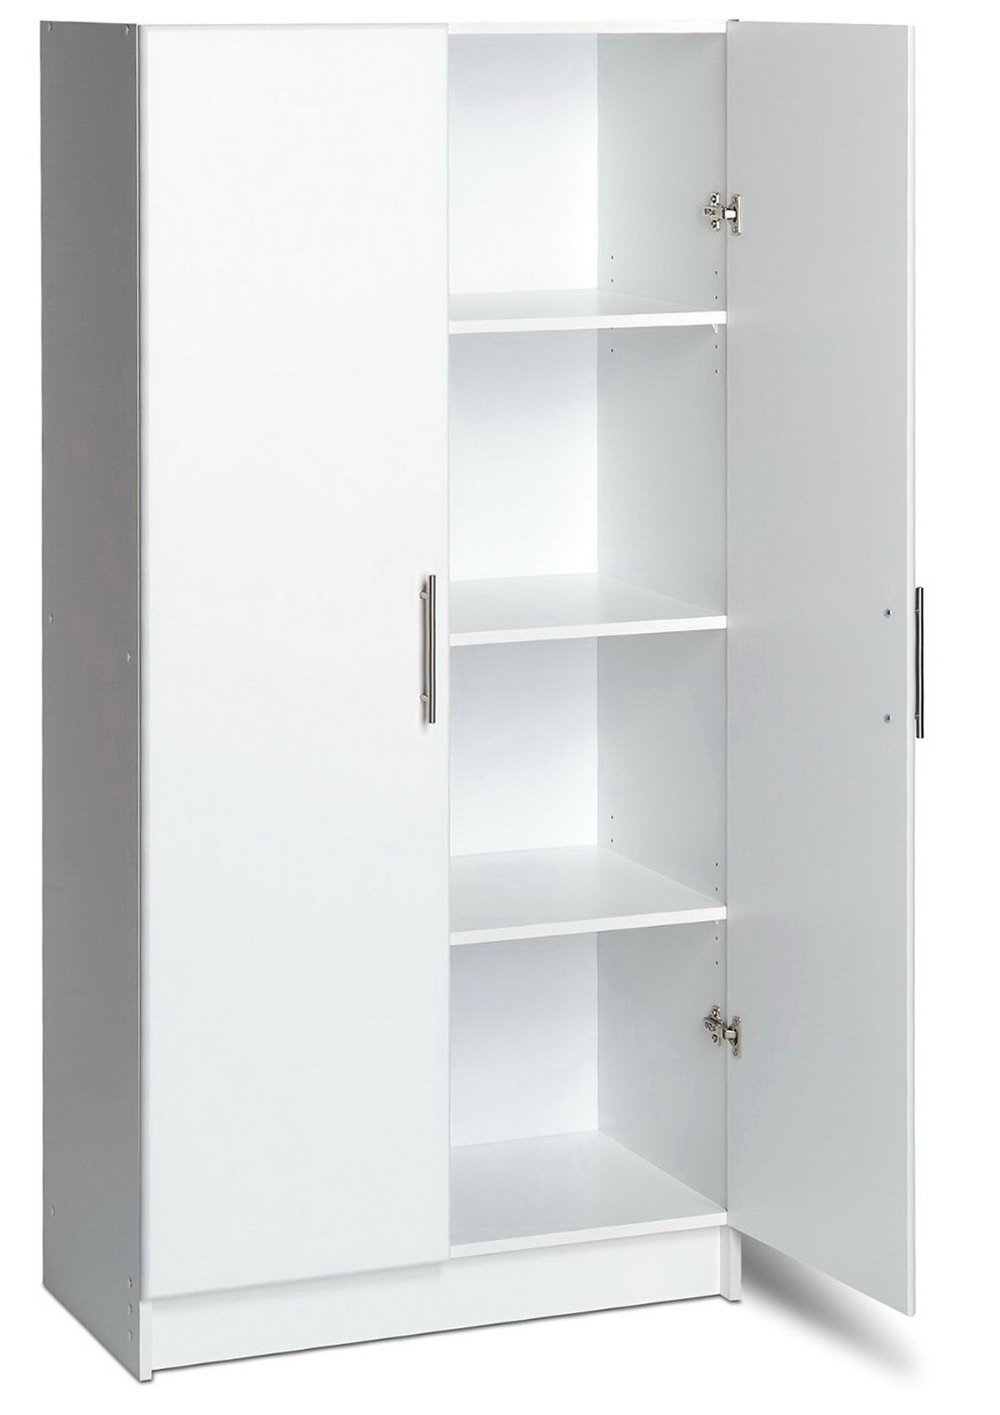 Free Standing Closet With Doors